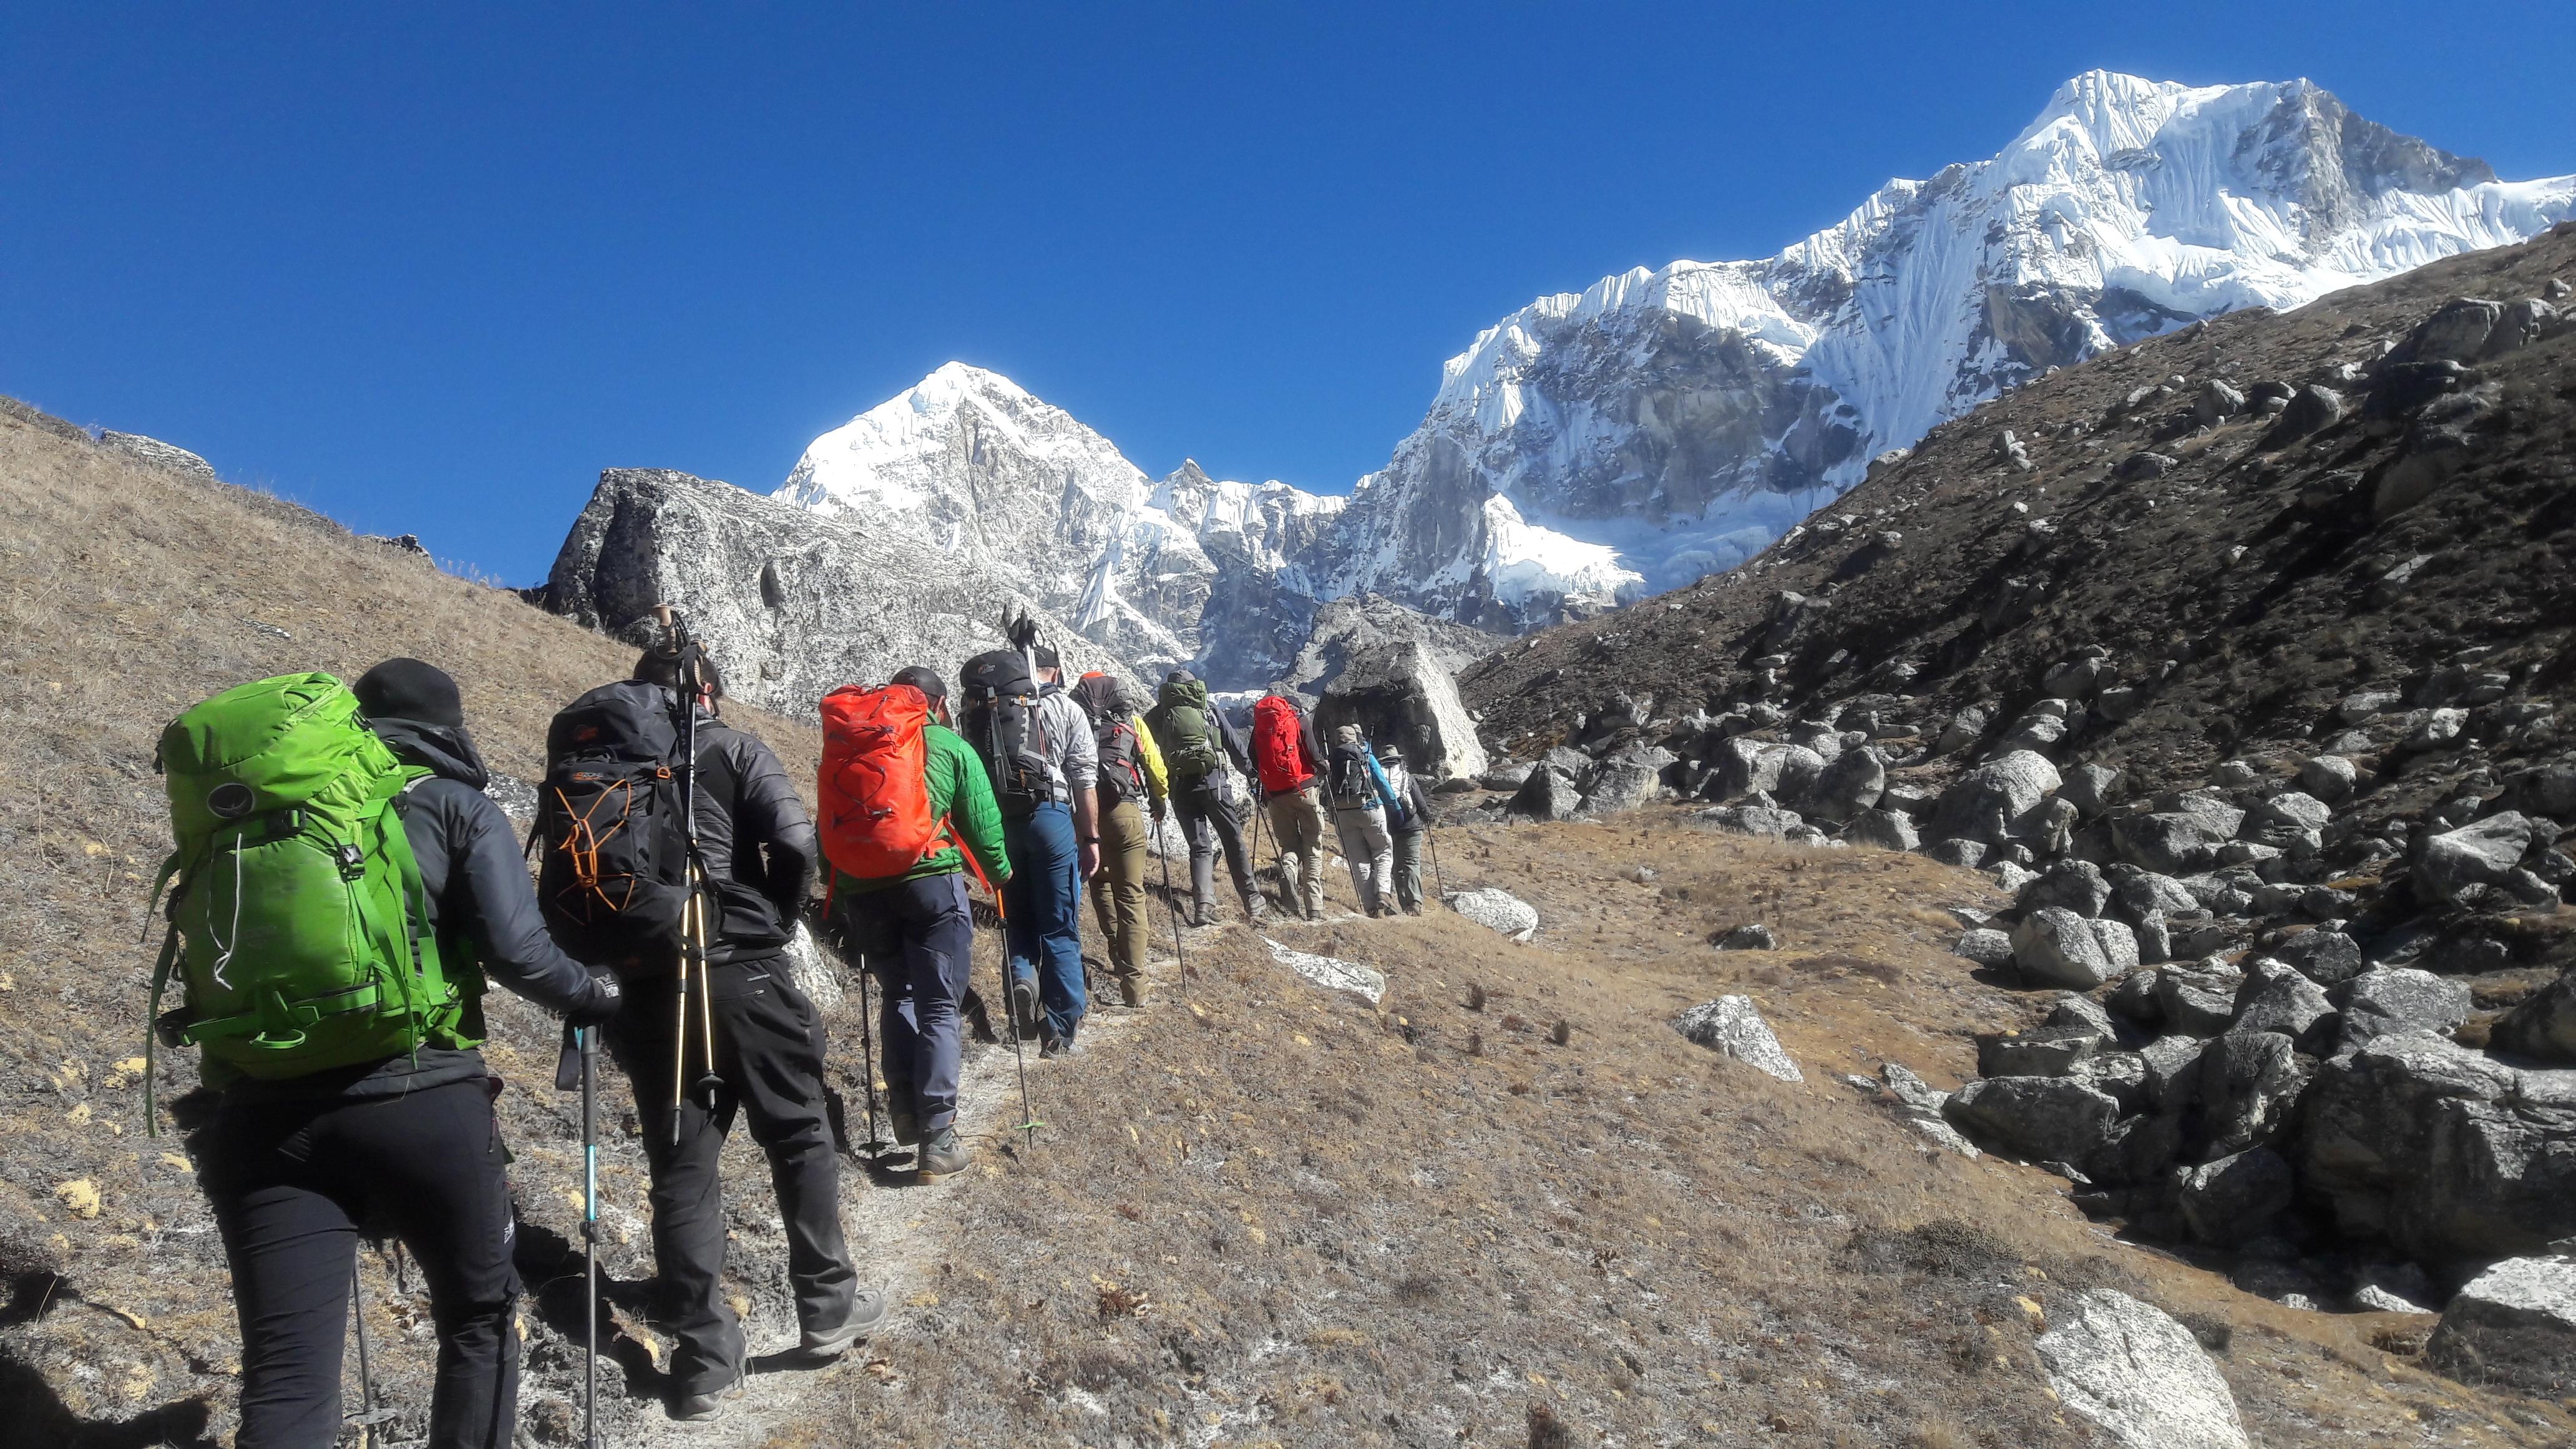 Trekking in Rolwaling